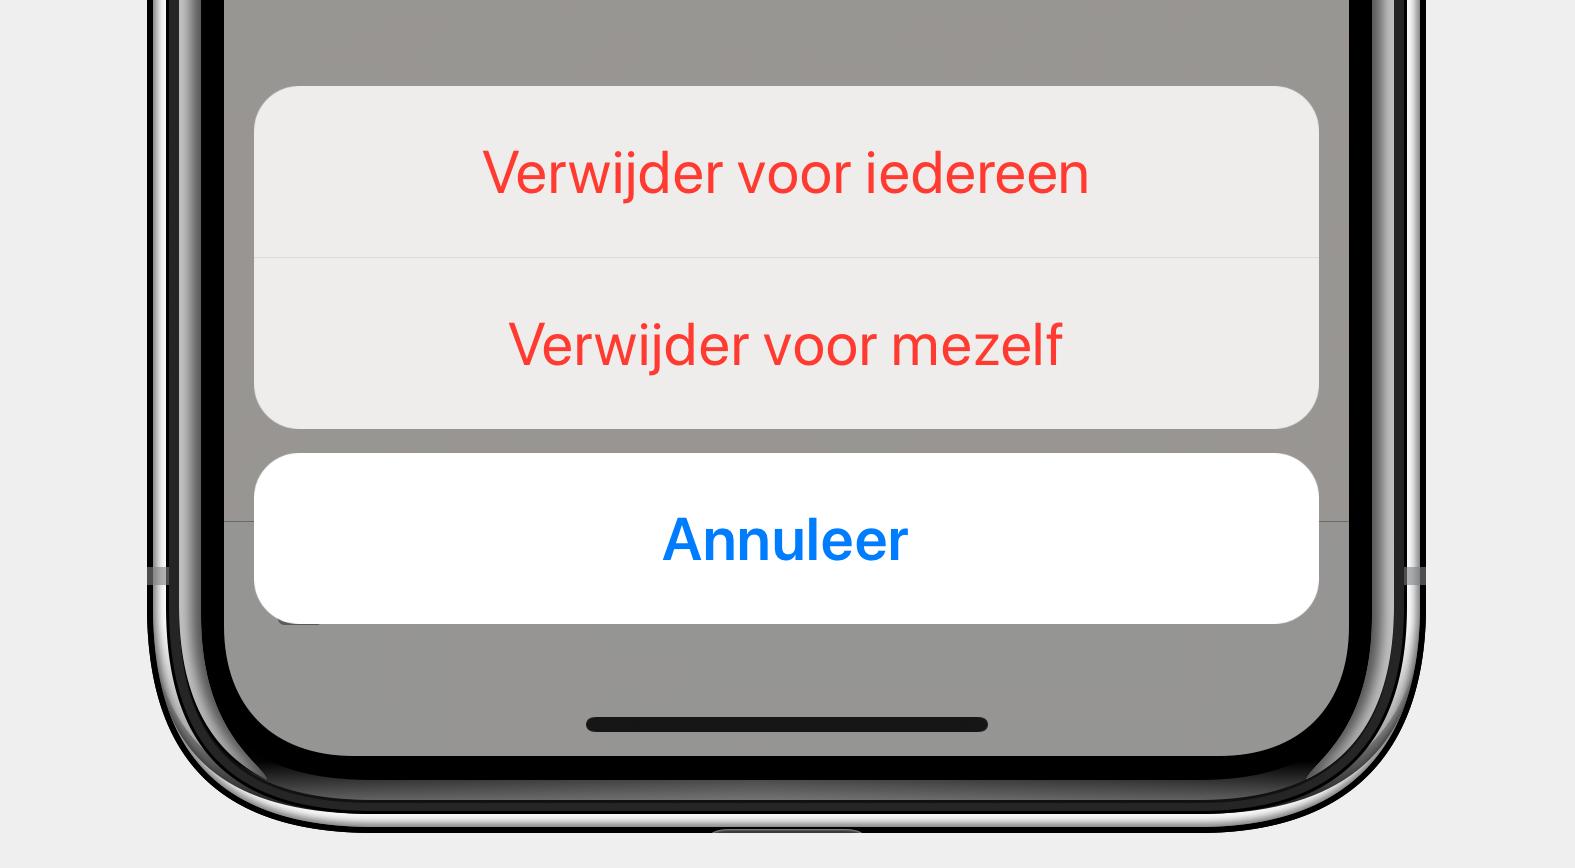 Whatsapp verwijder bericht screenshot